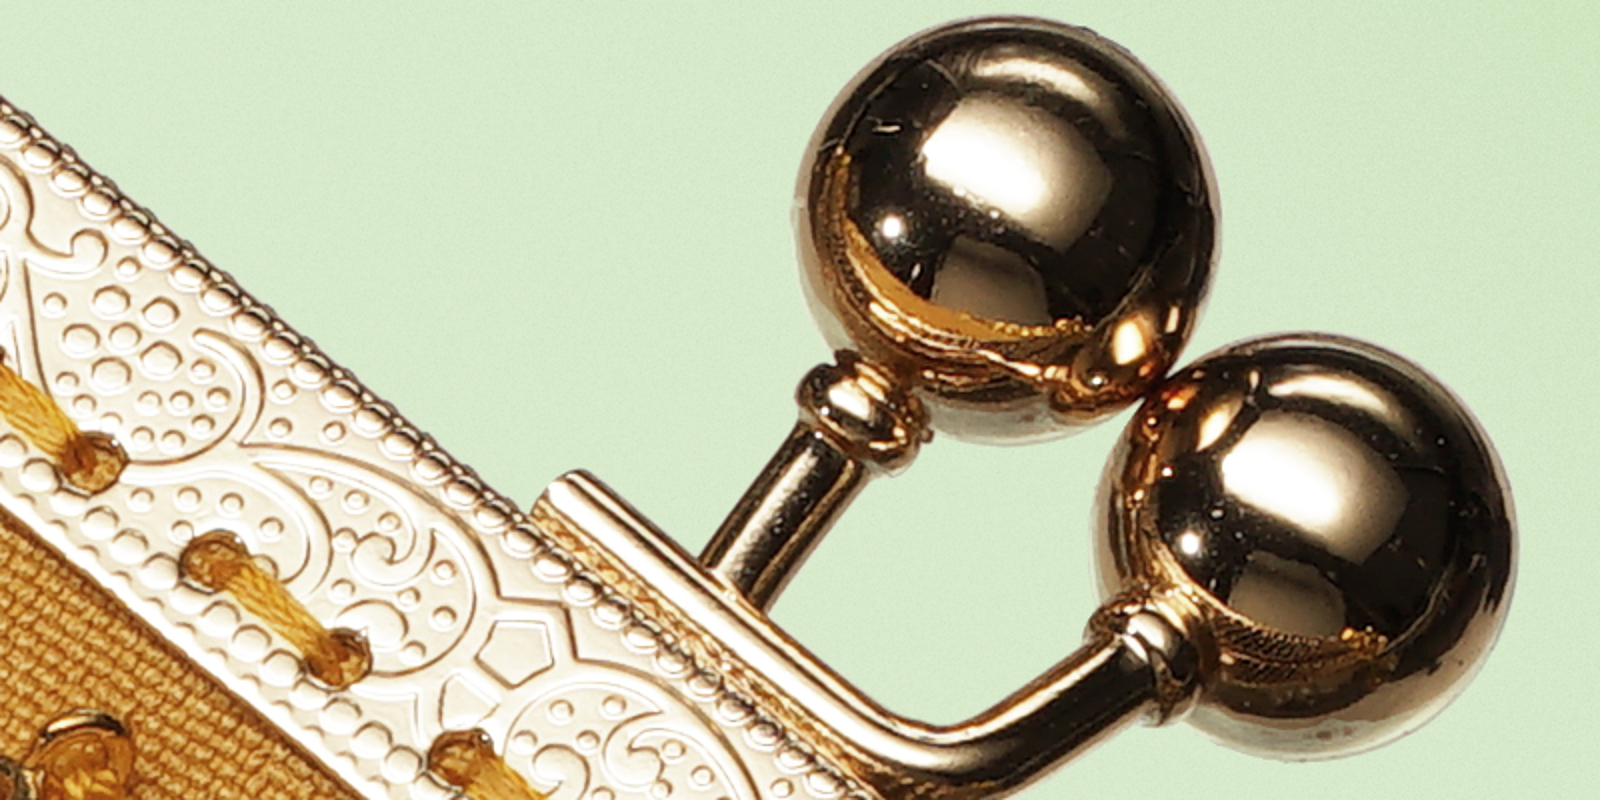 IMAGE: http://makino.fi/rico/fm/goldpurse3b.jpg